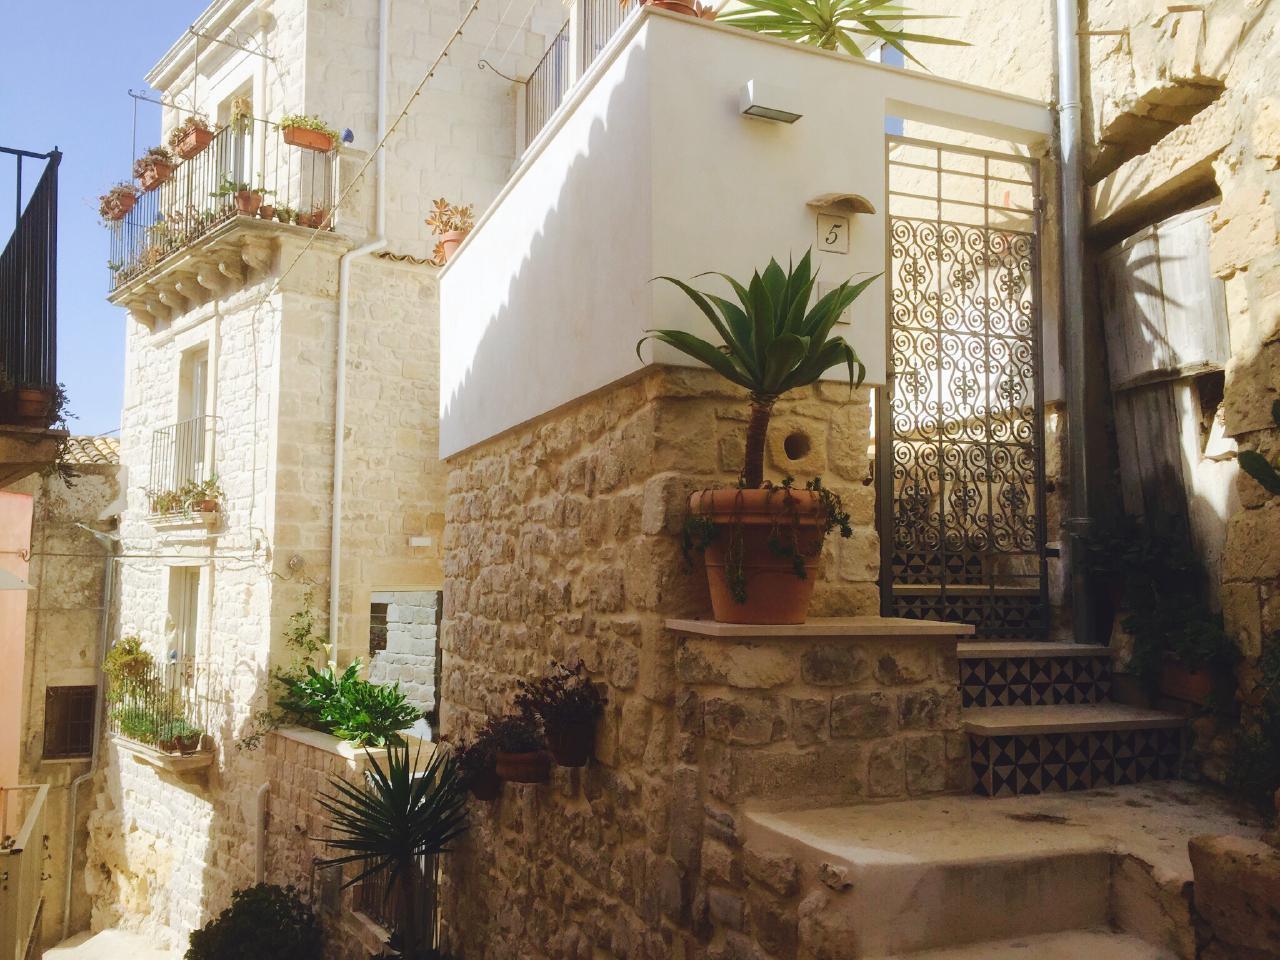 Maison de vacances Terrazza Barocca (1648450), Modica, Ragusa, Sicile, Italie, image 8